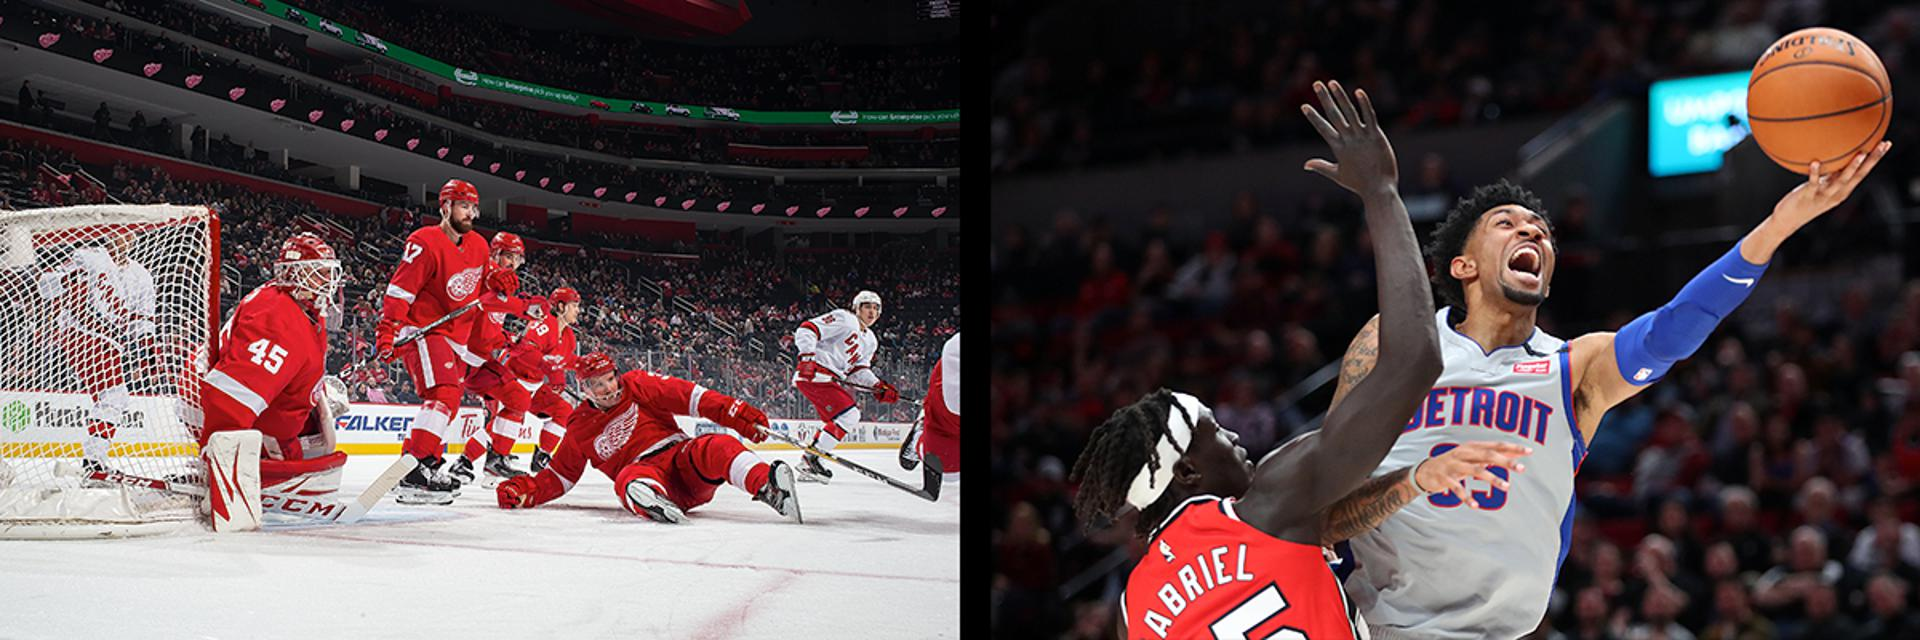 detroit-red-wings-by-Dave-Reginek-NHLI-Getty-Images